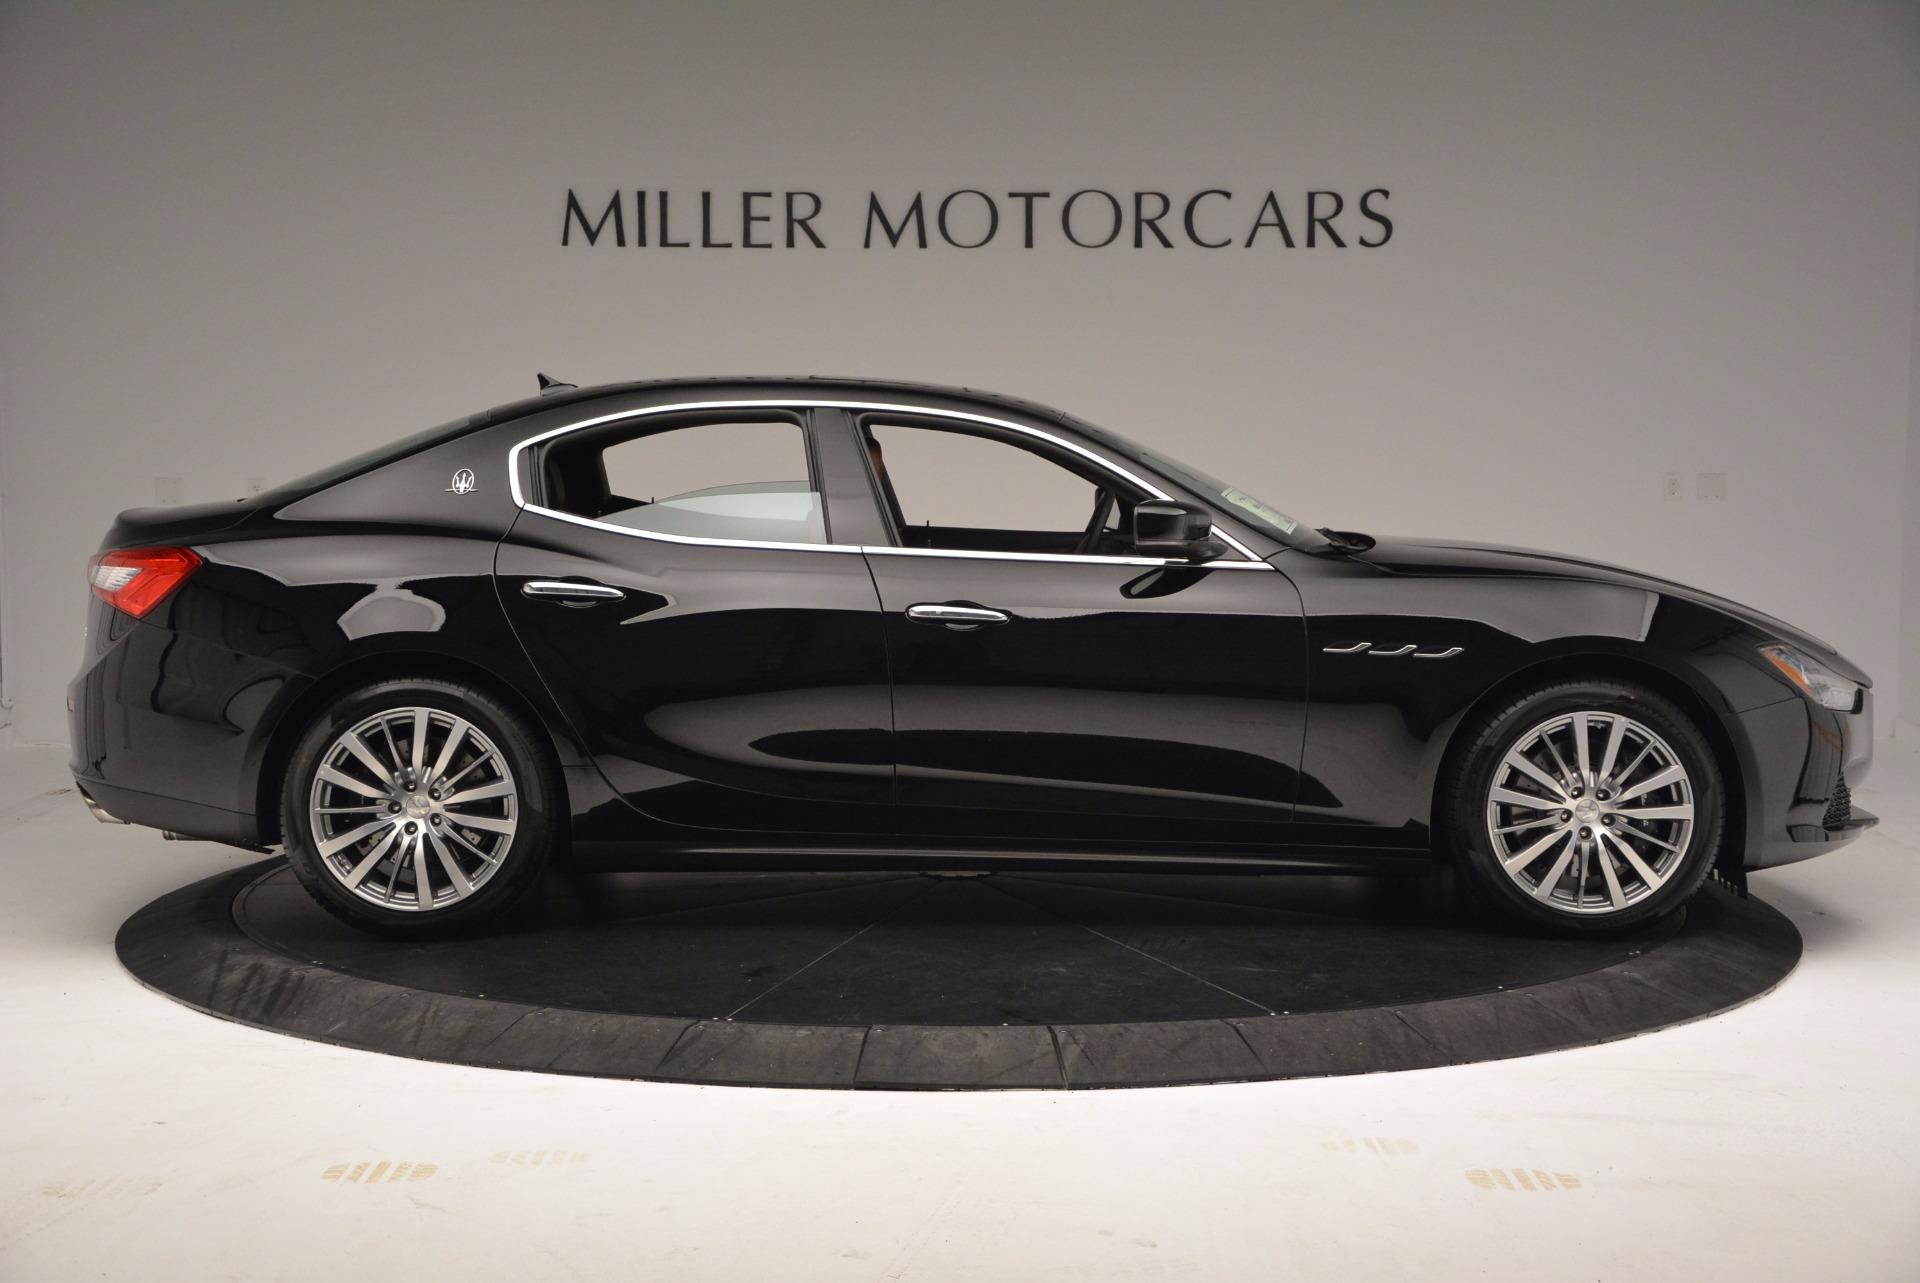 New 2017 Maserati Ghibli S Q4 EX-LOANER For Sale In Greenwich, CT 1115_p9